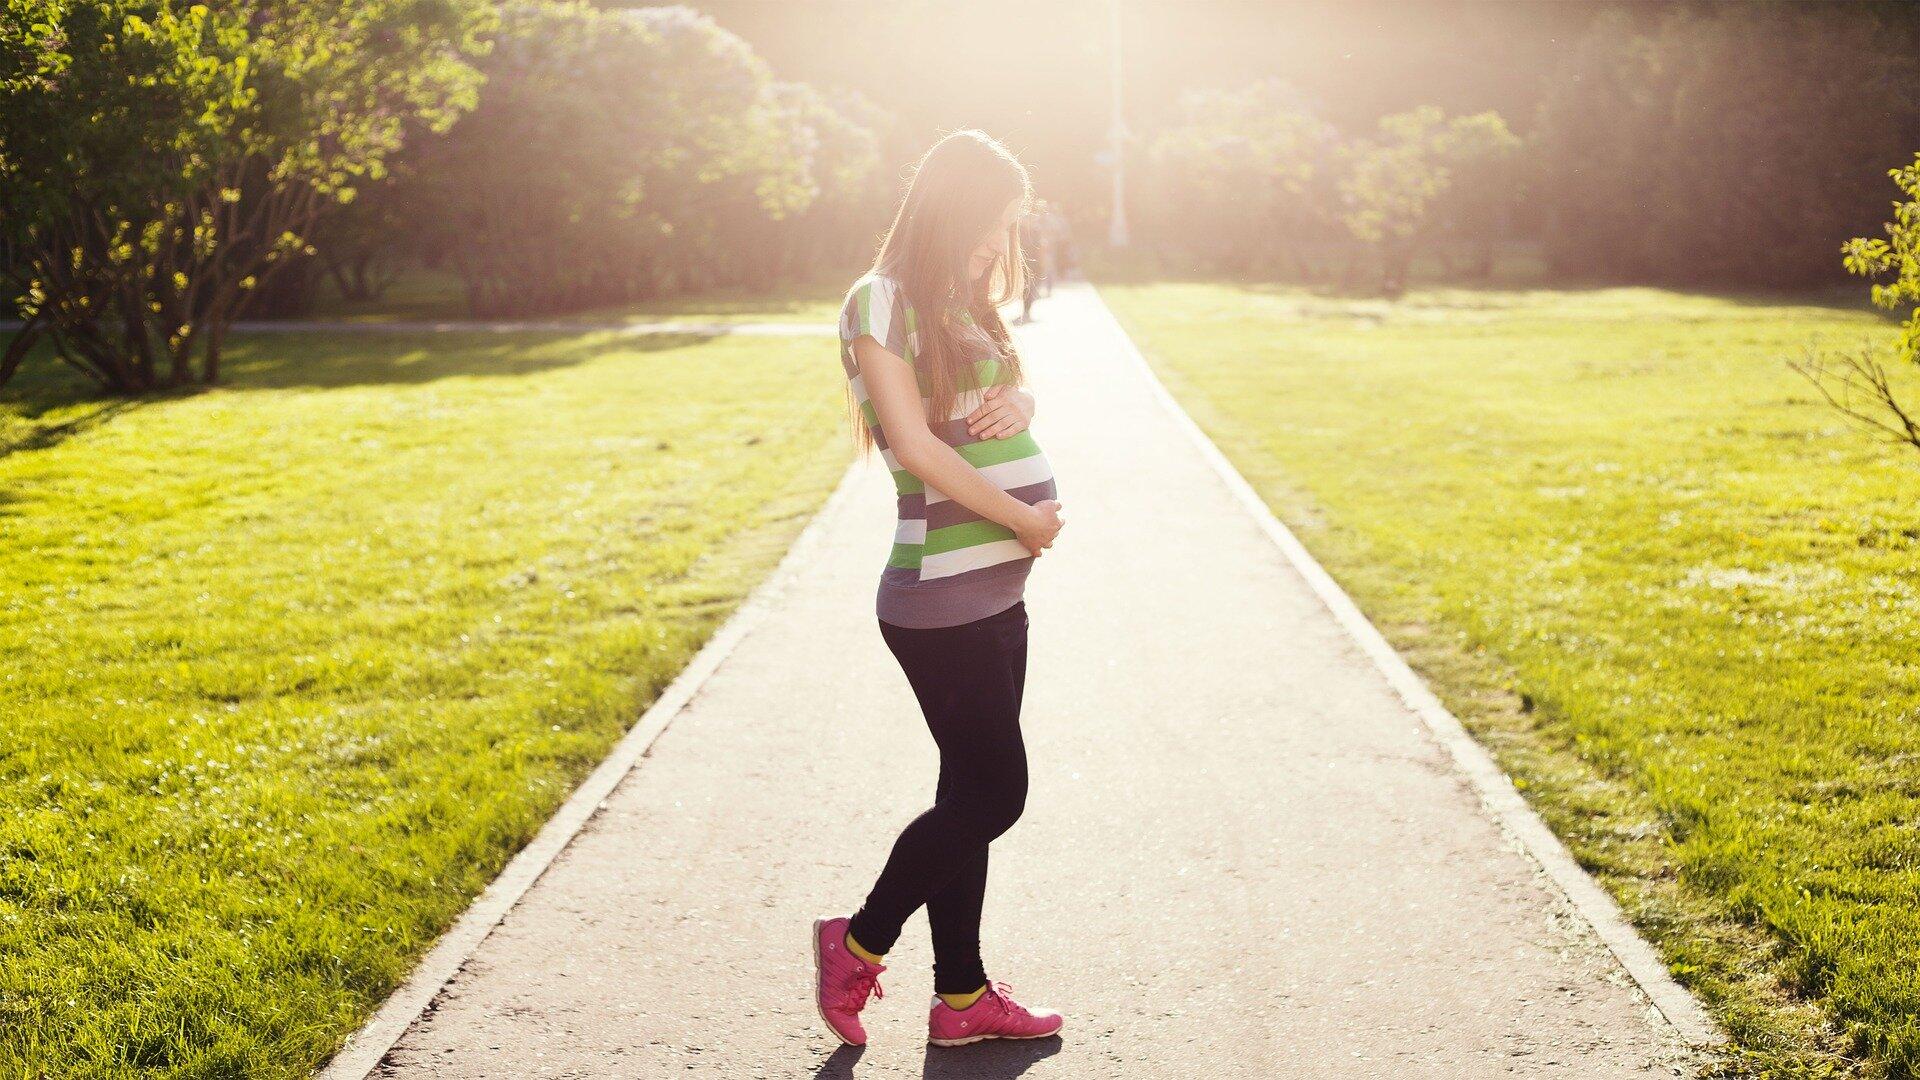 Pregnant_Exercise_WHEN.jpg